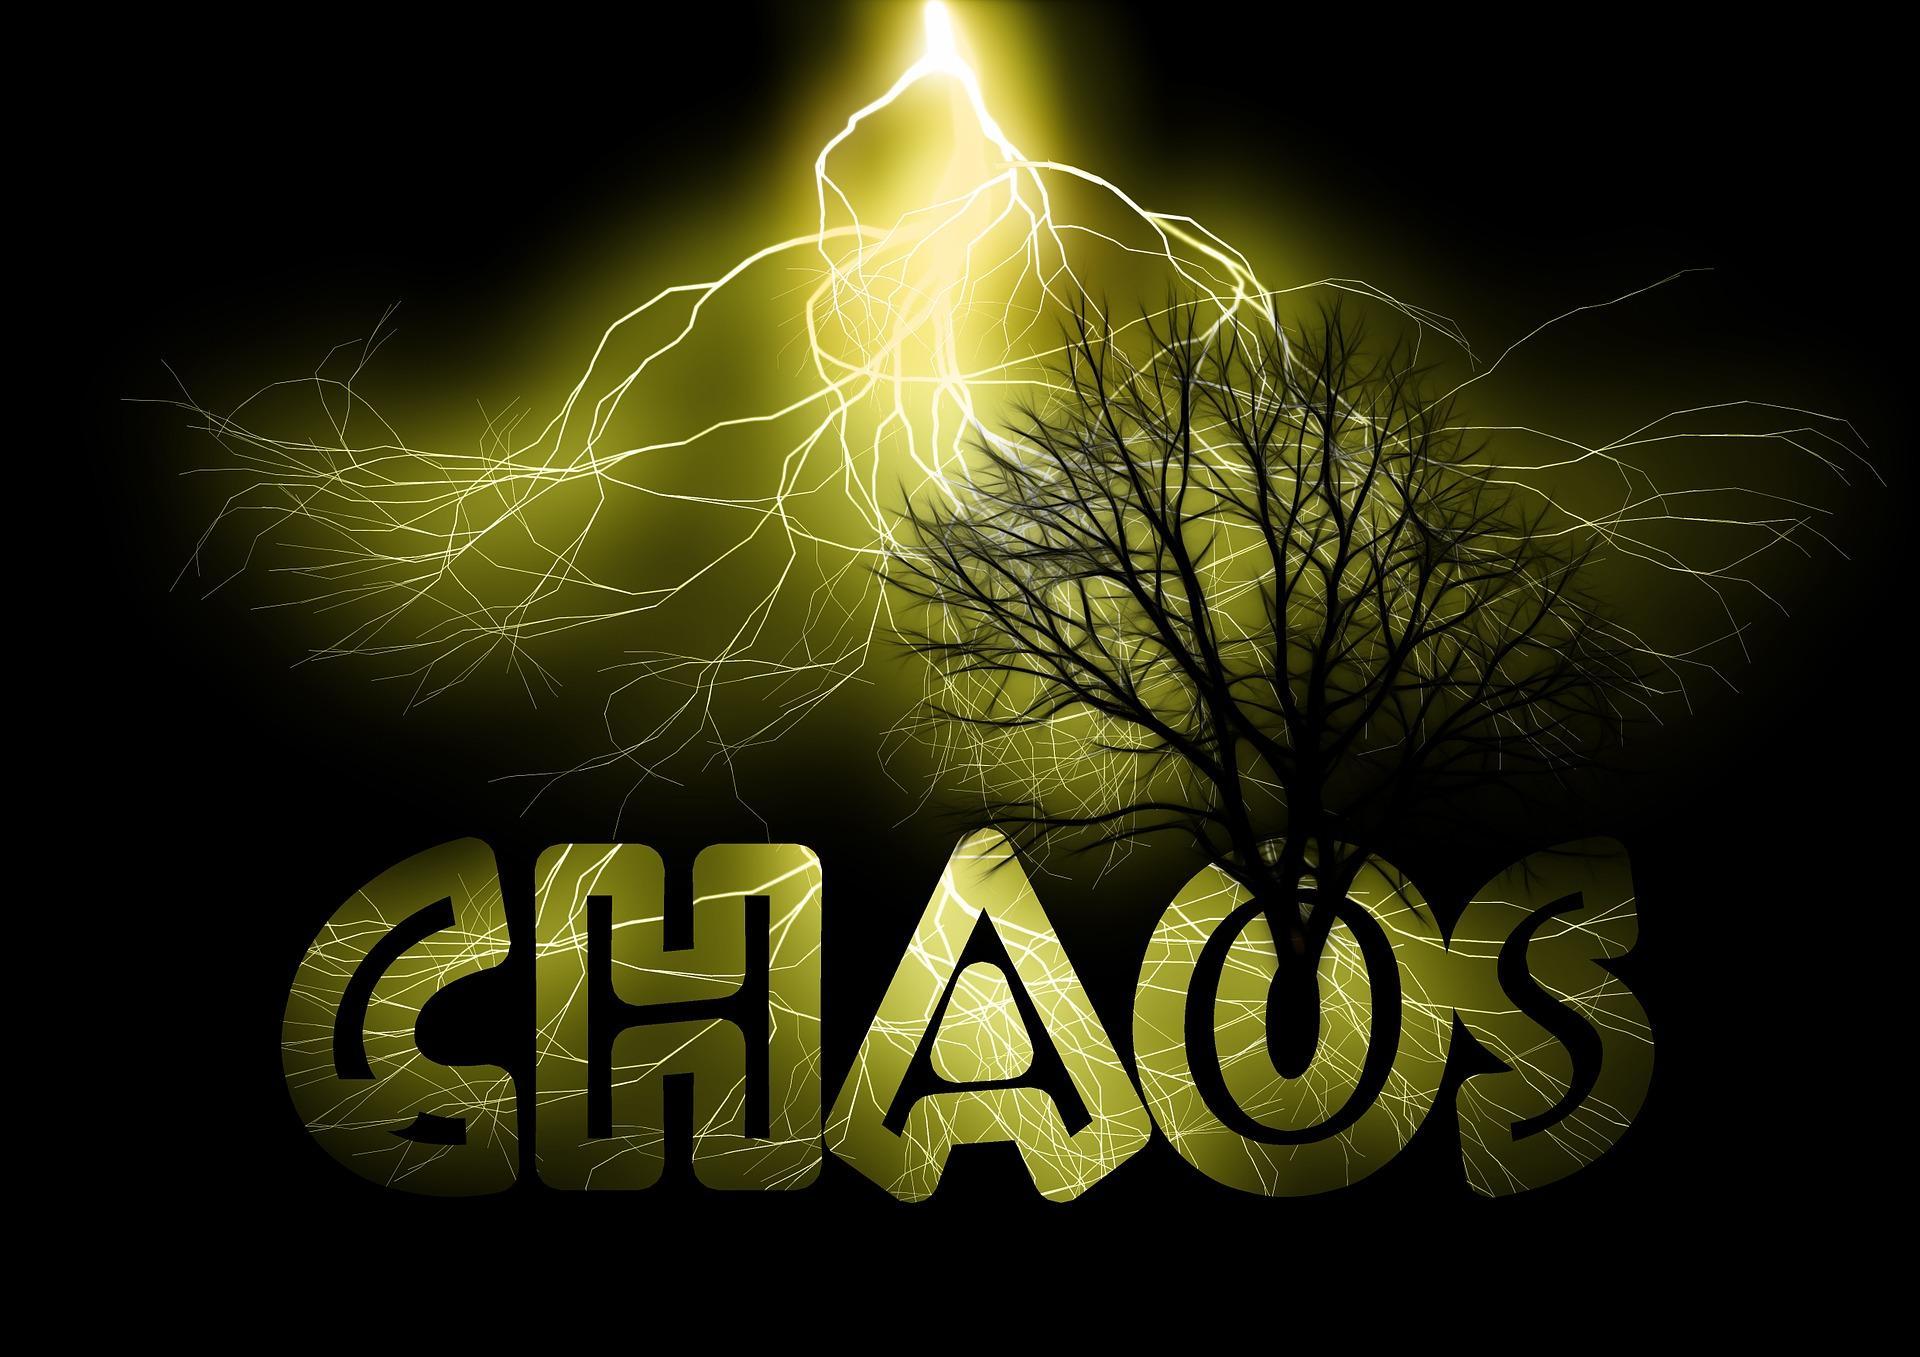 chaos 485498 1920 - Le Dieu du Chaos